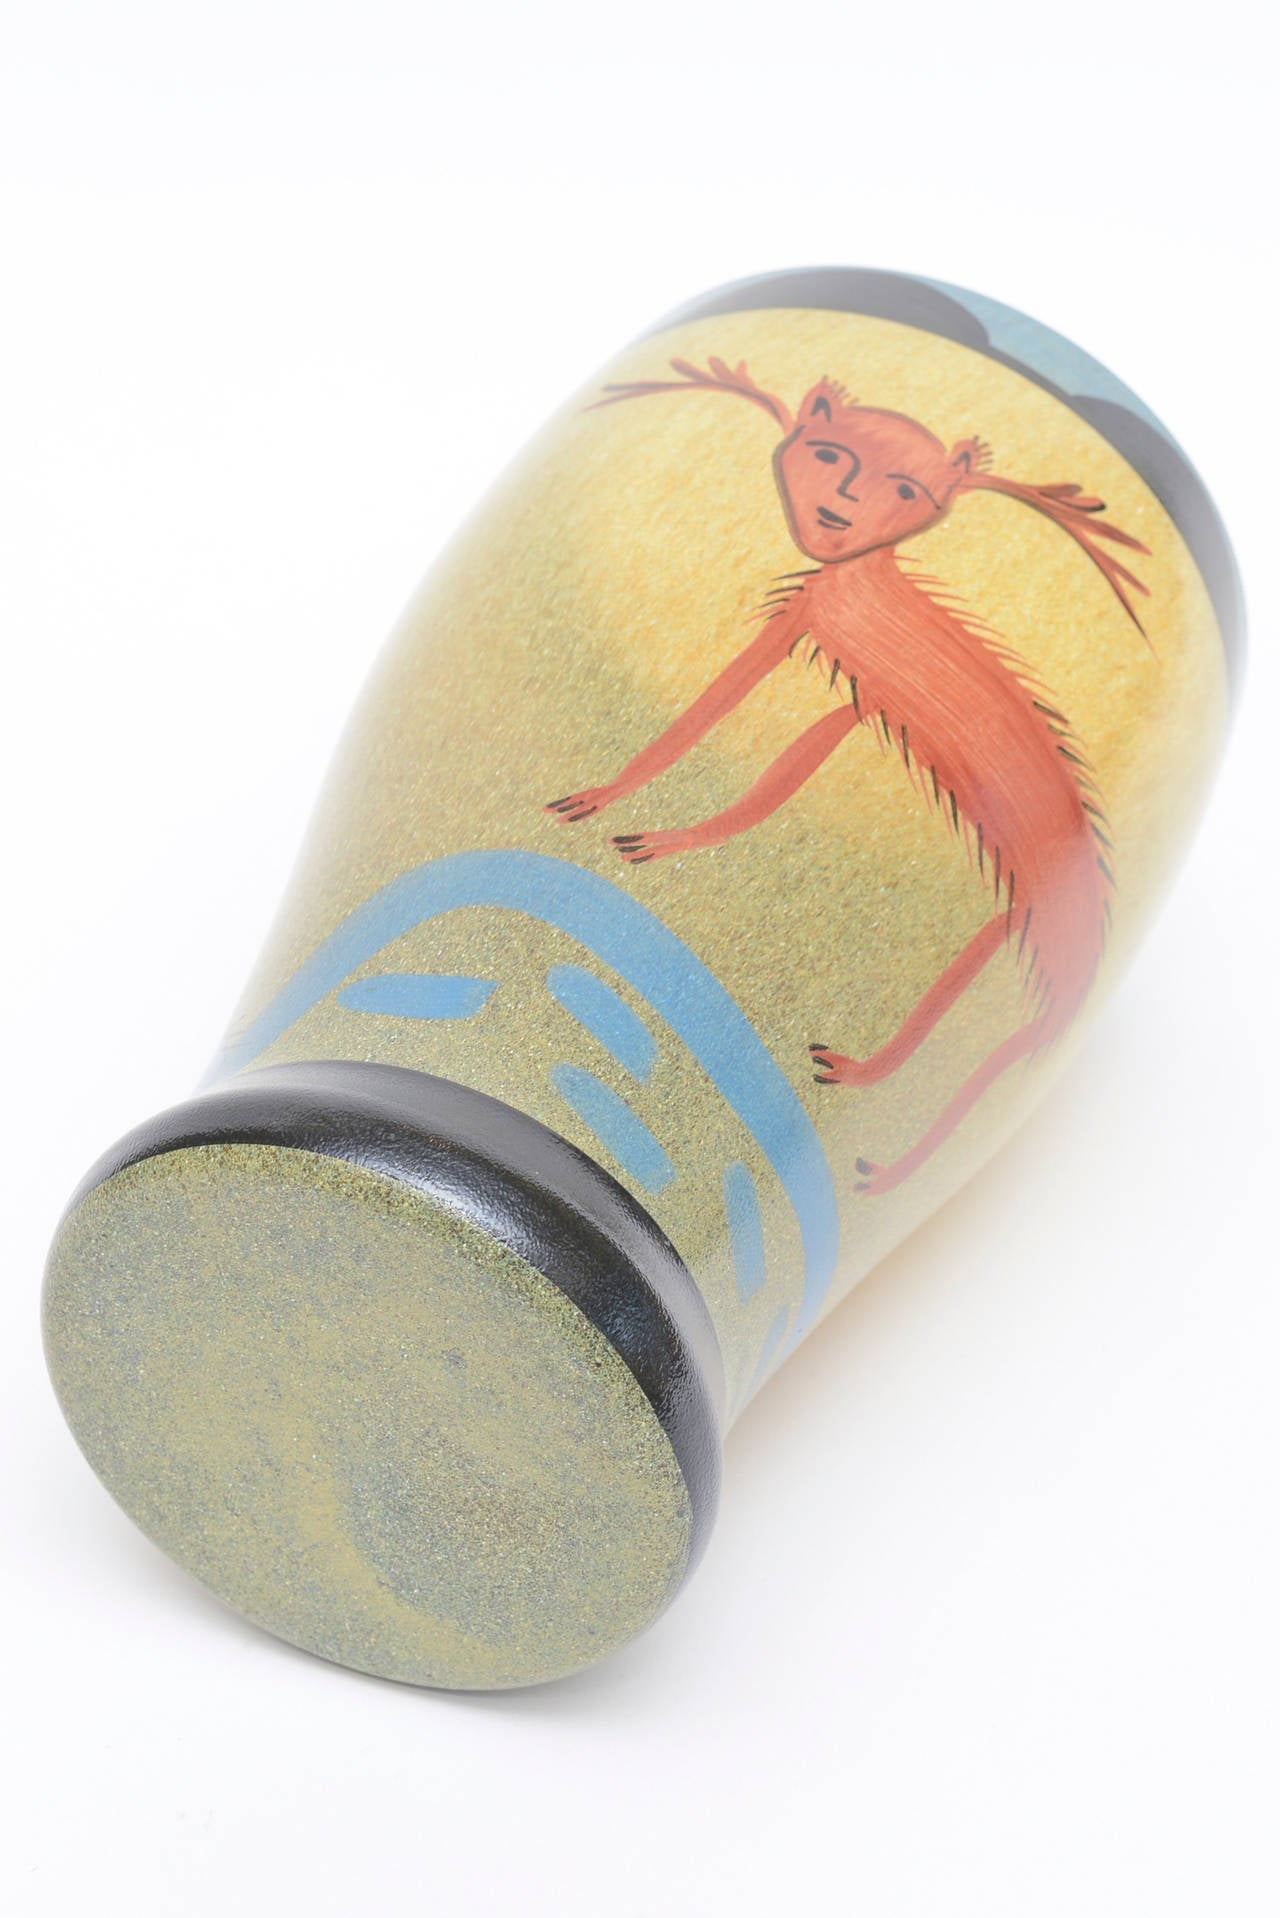 Ulrica Hydman Vallien for Kosta Boda Primitive Painted Glass Vase 4